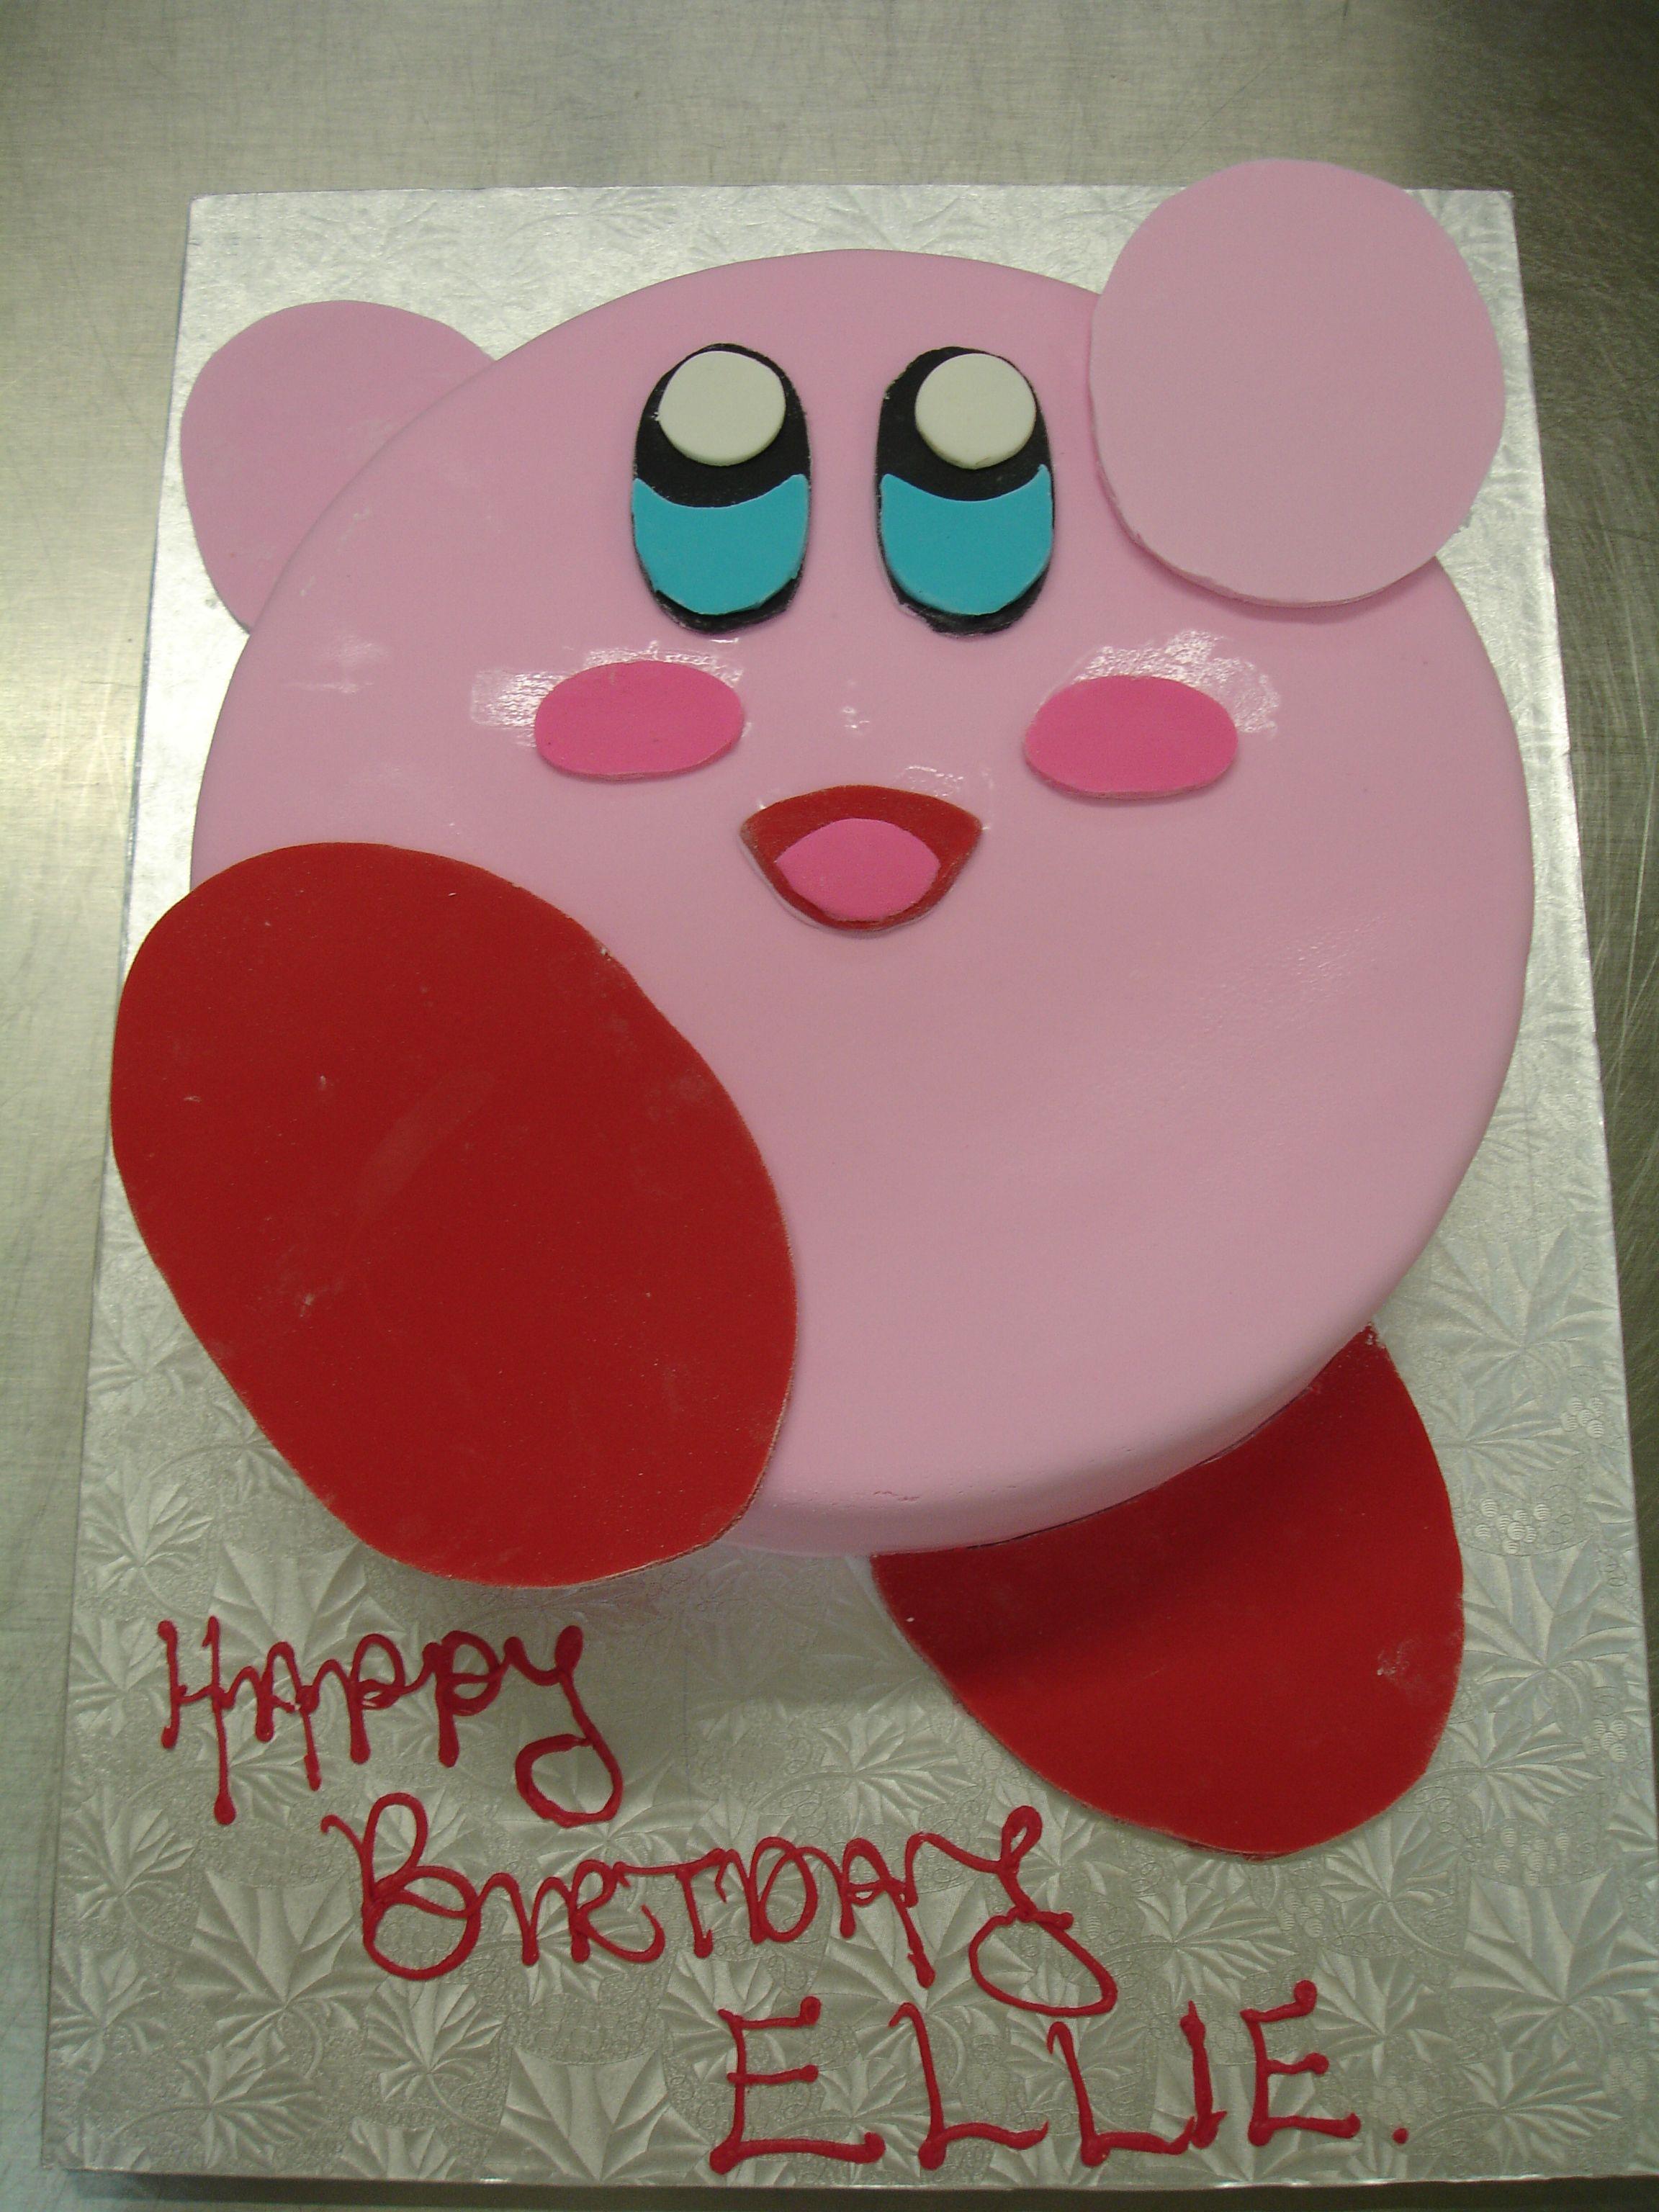 Birthday cake 427 by select bakery 405 donlands ave